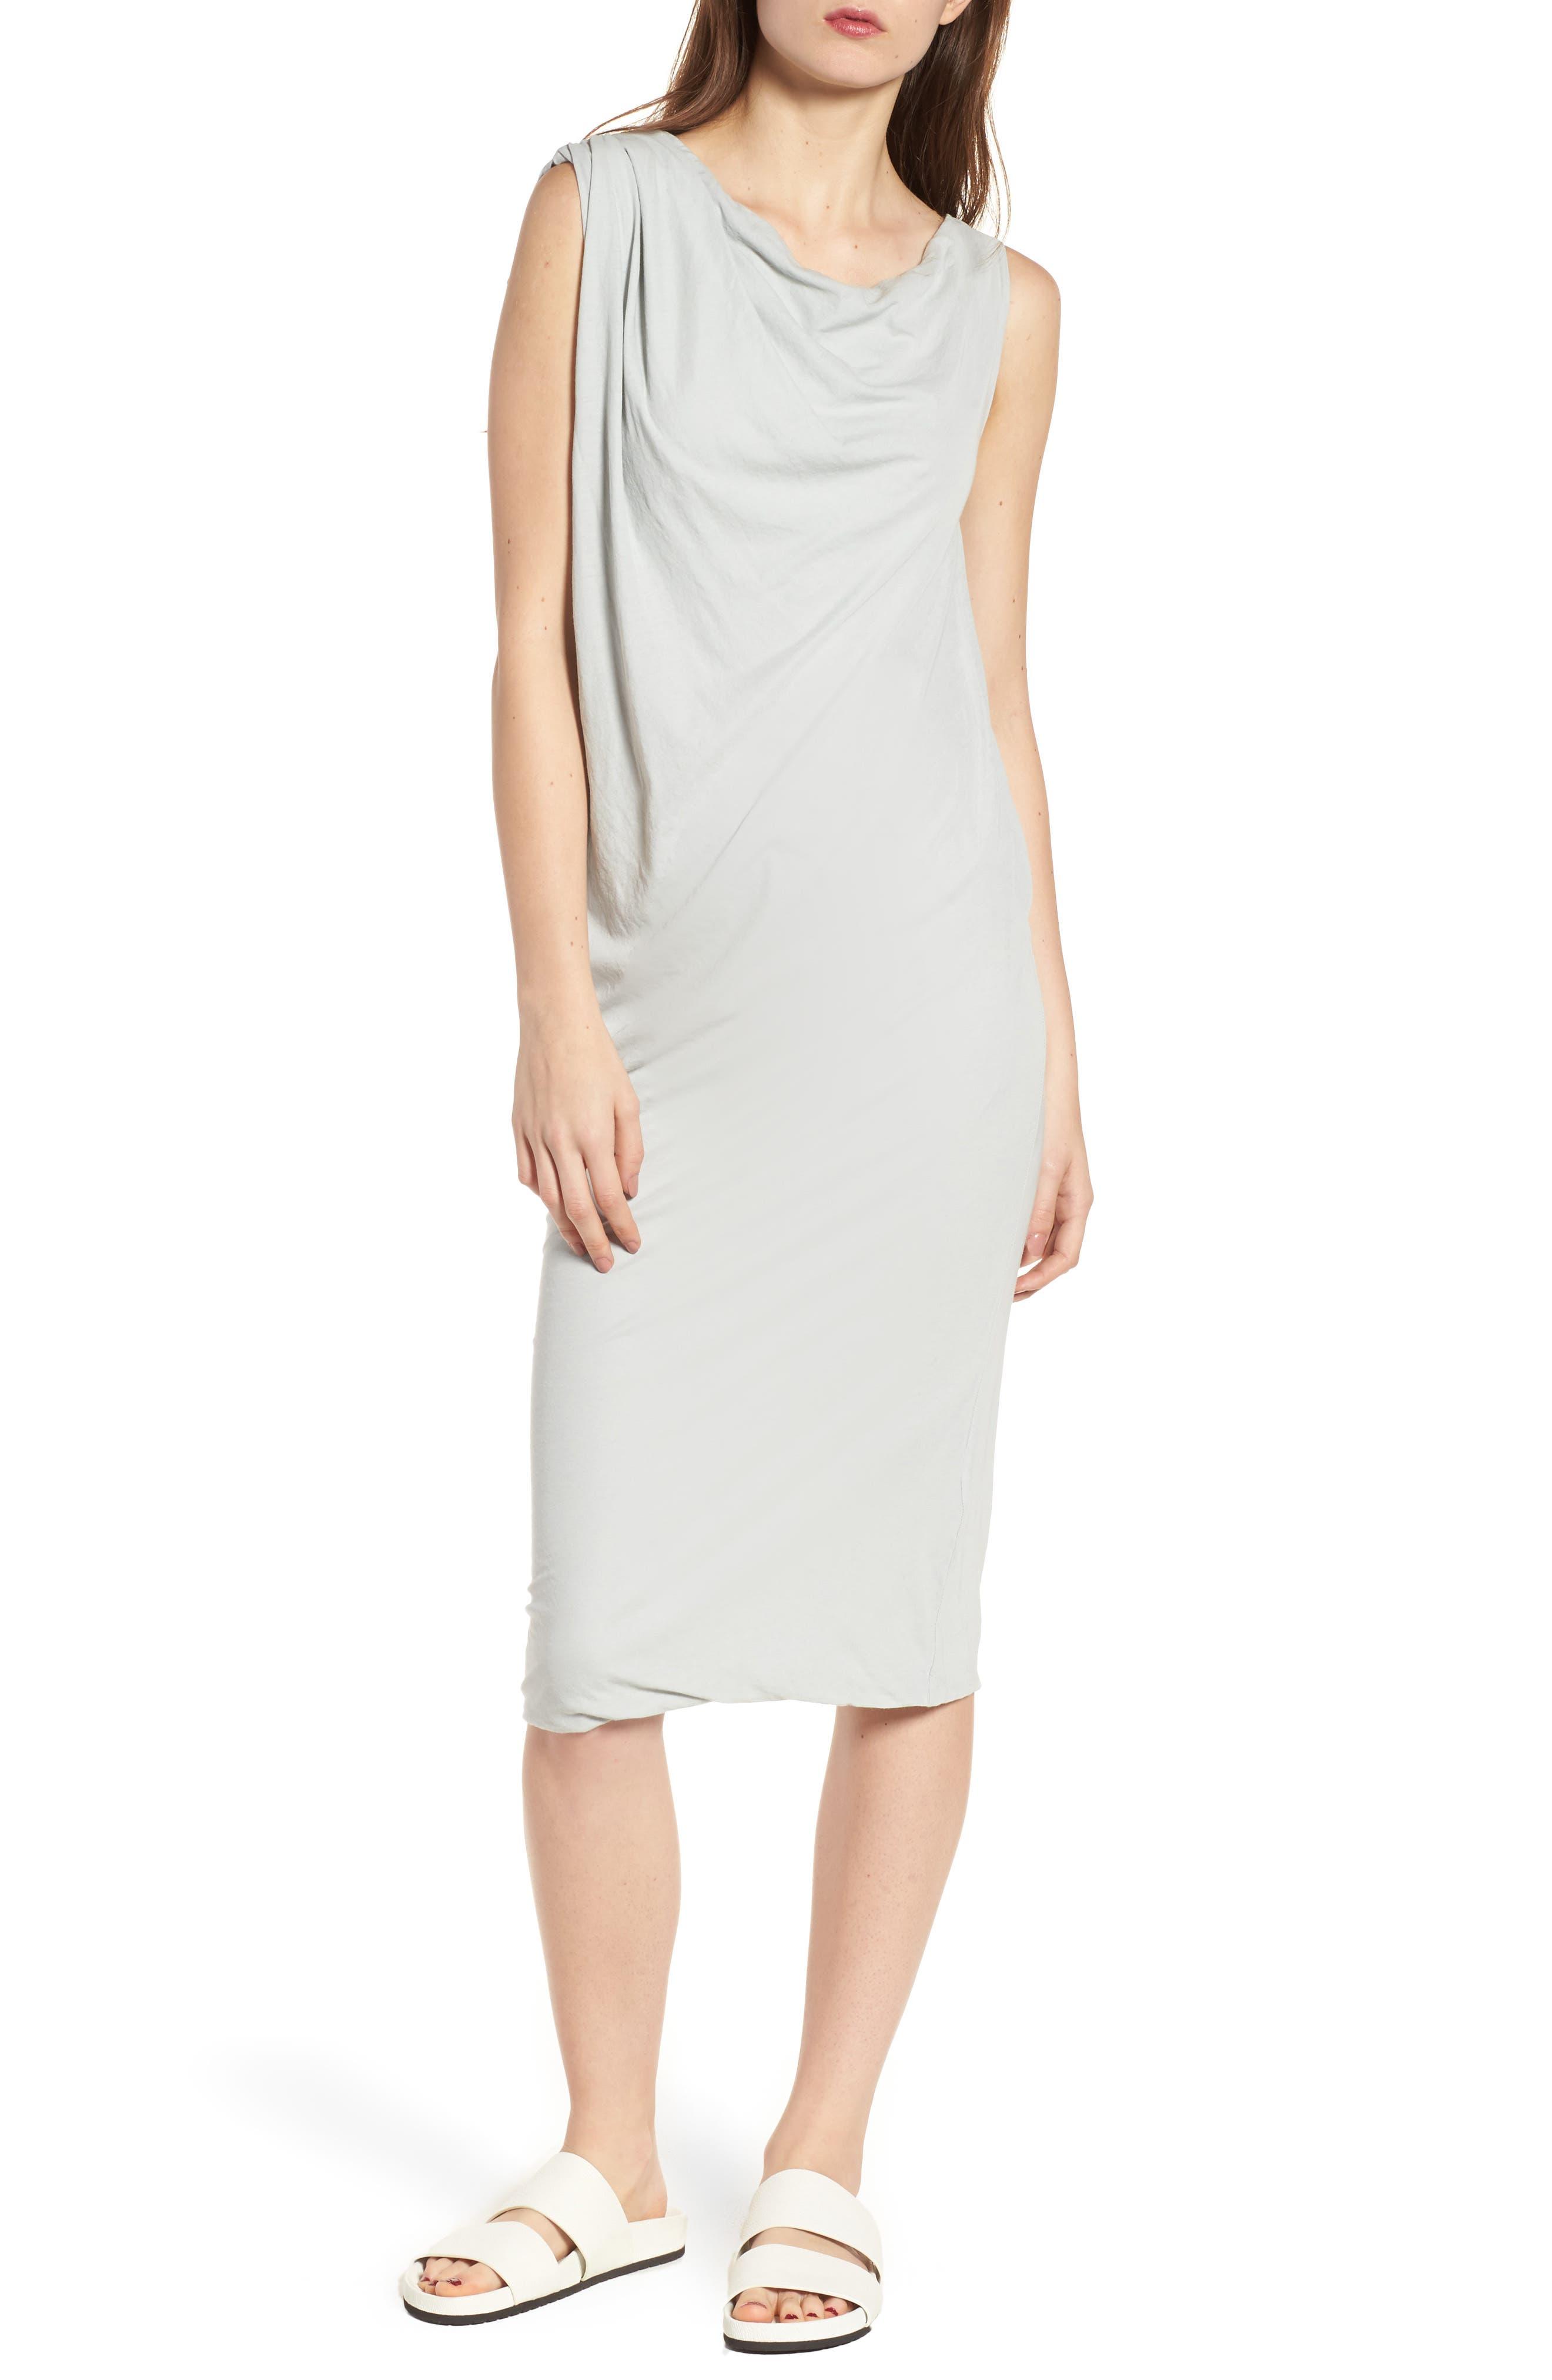 Alternate Image 1 Selected - James Perse Draped One-Shoulder Midi Dress